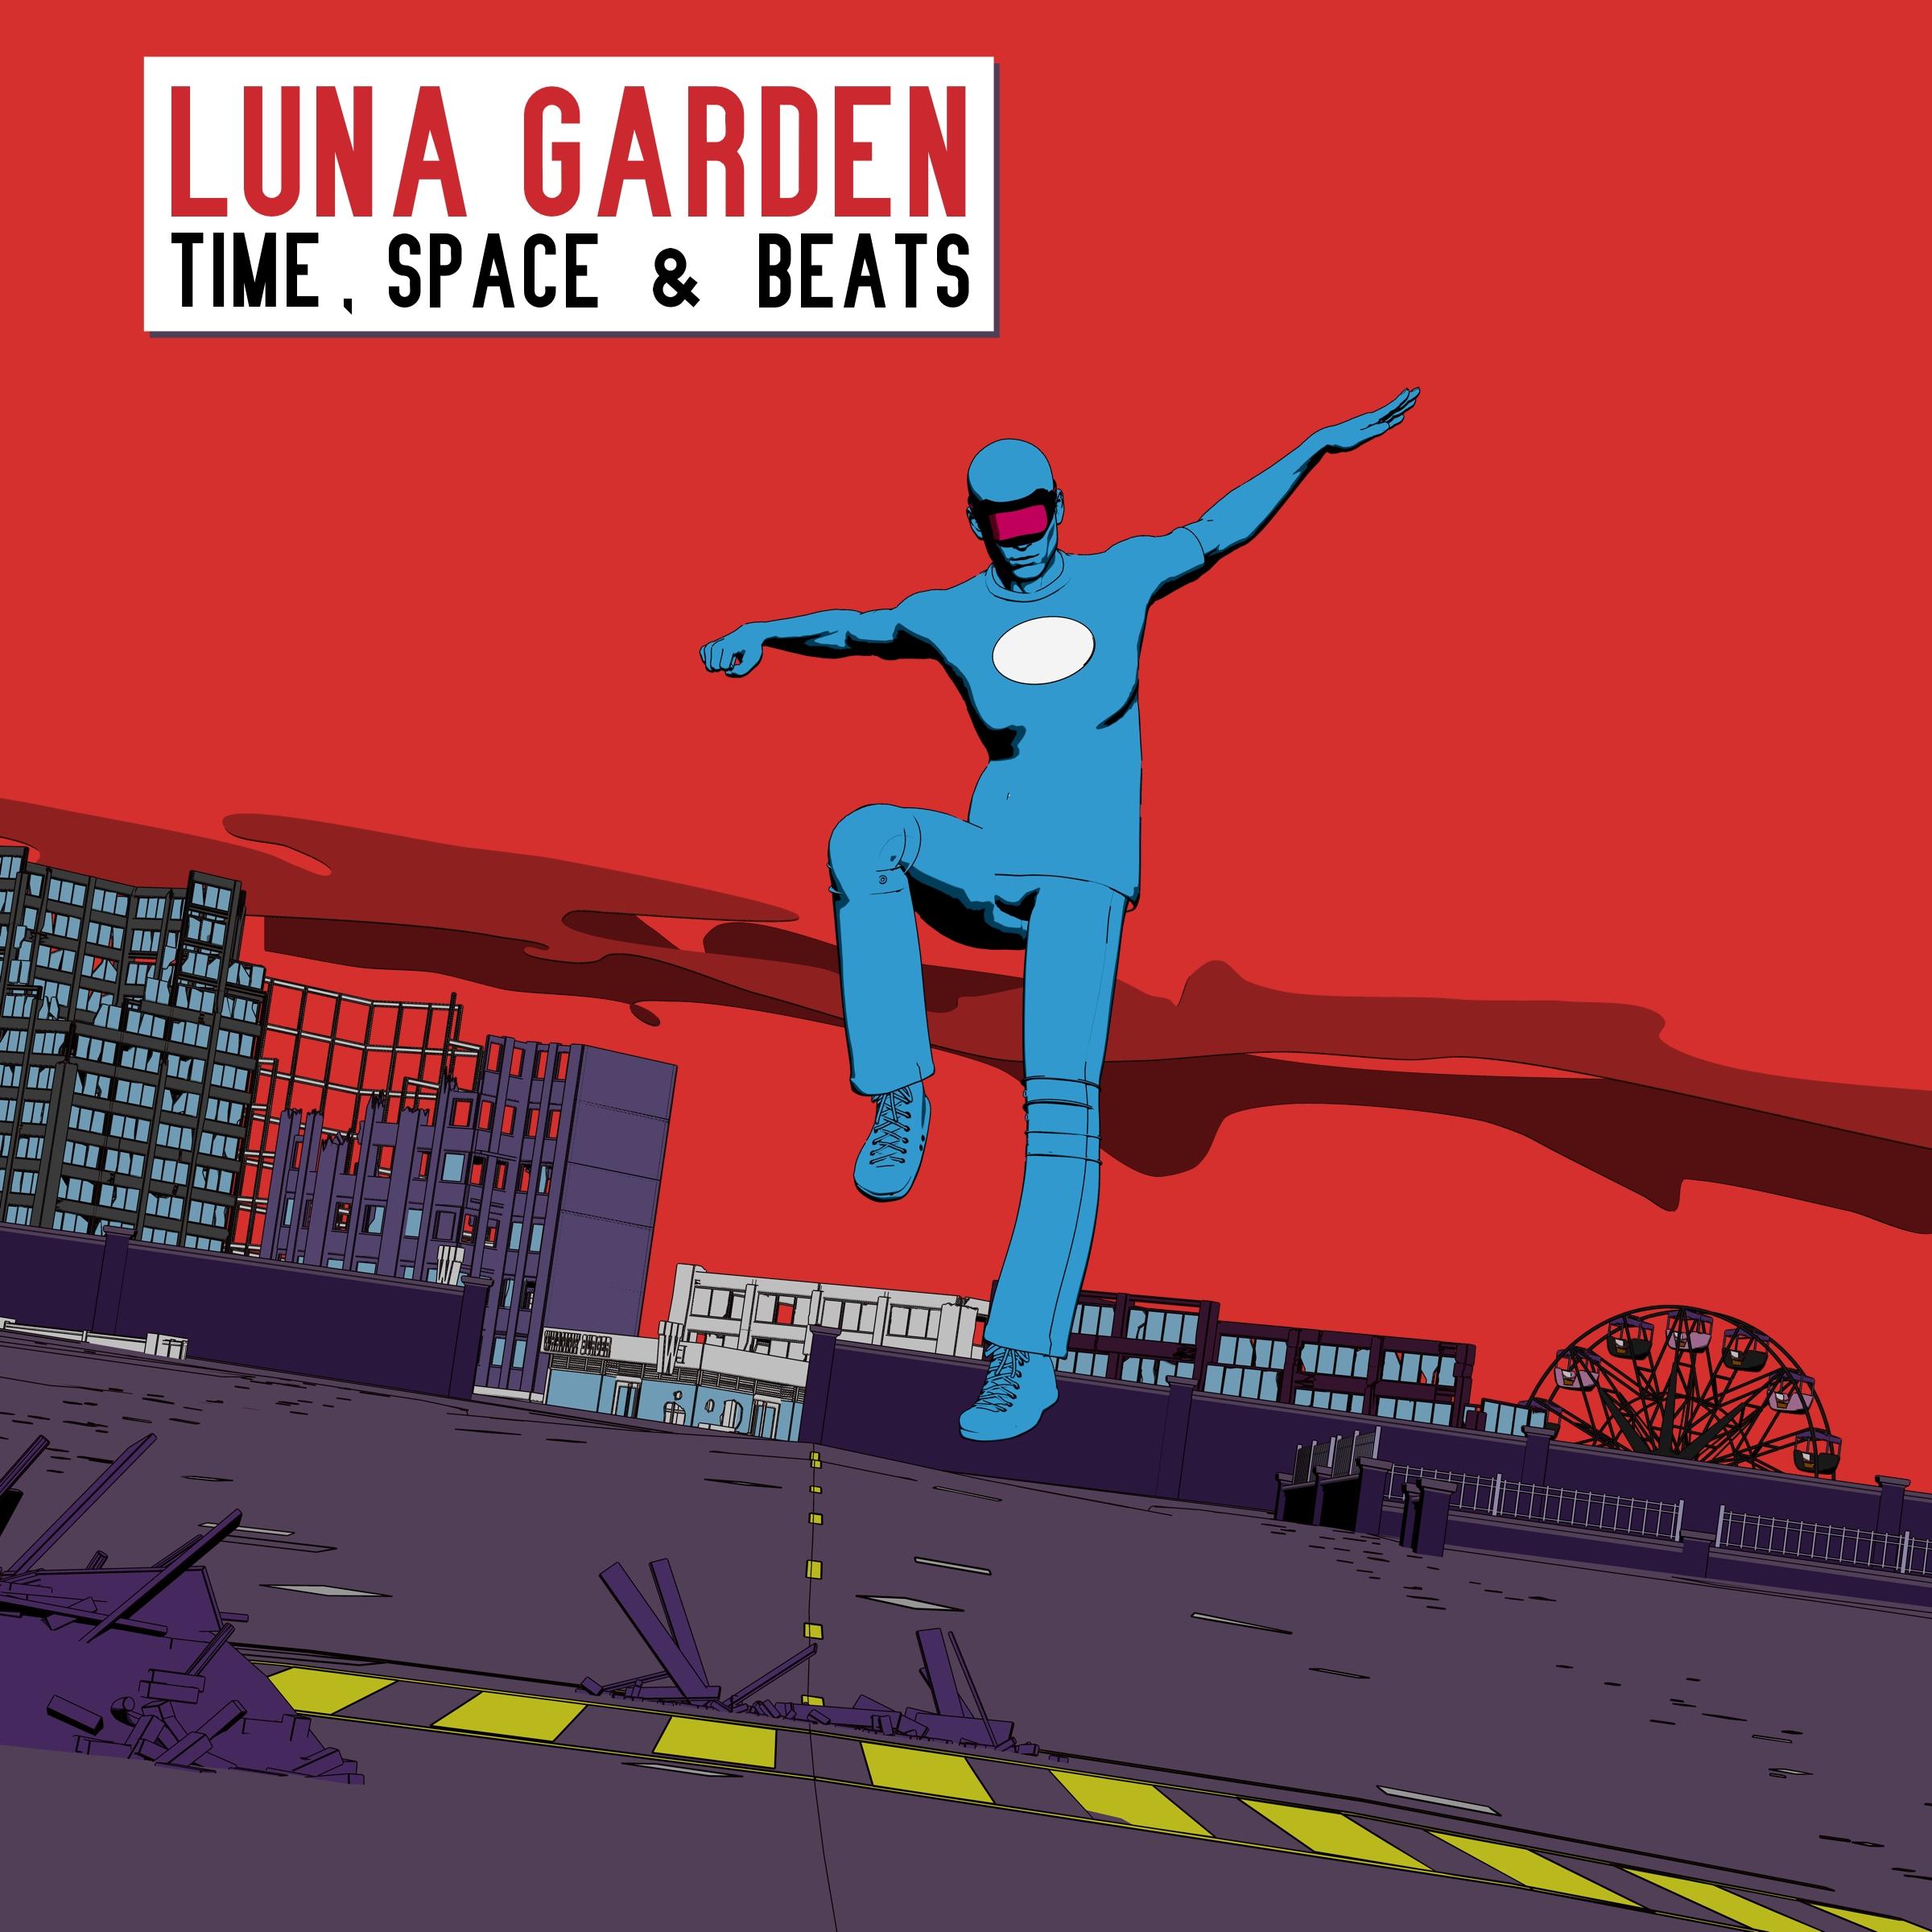 Luna Garden - Time Space & Beats